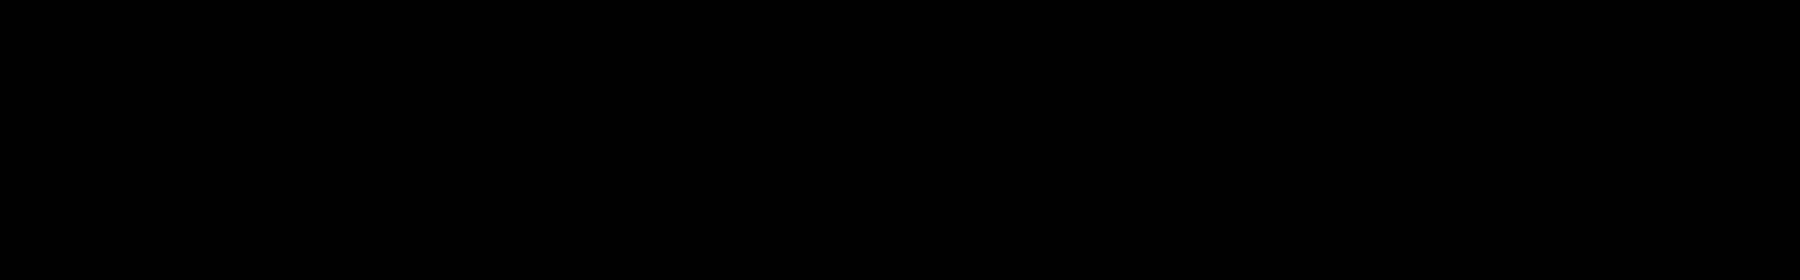 Amethyst 2 - Future Bass audio waveform